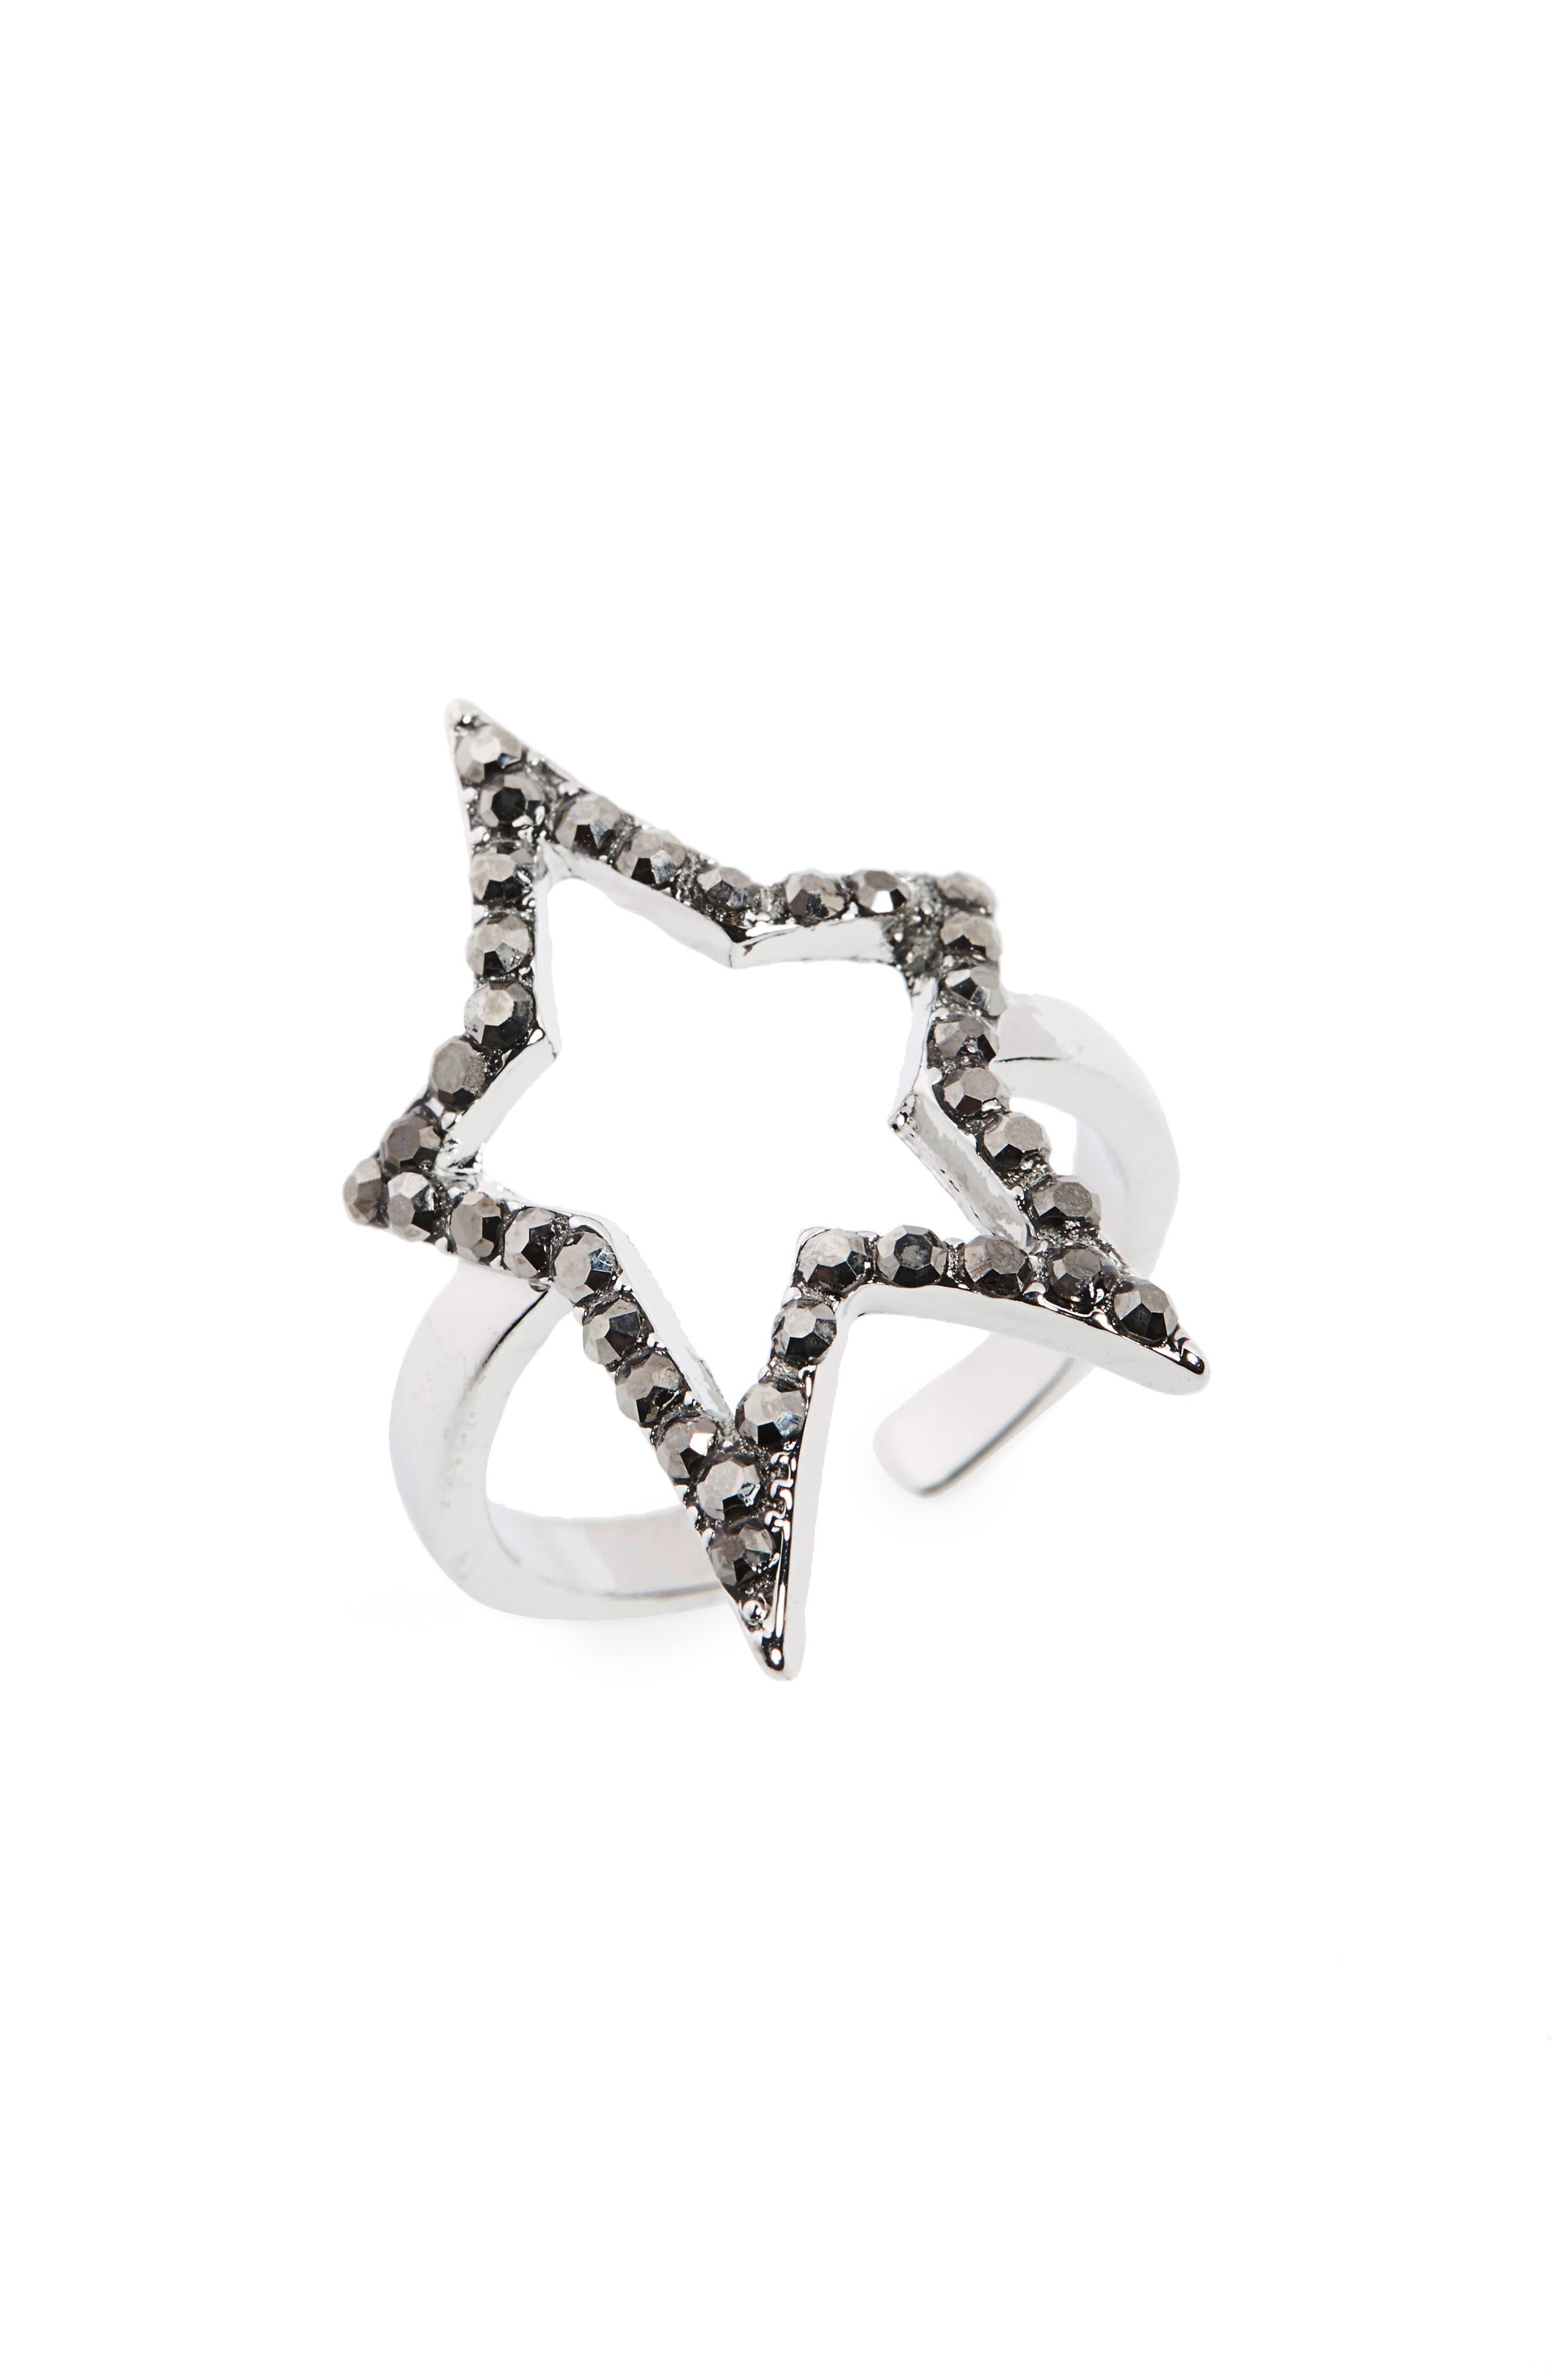 Main Image - Natasha Open Star Ring